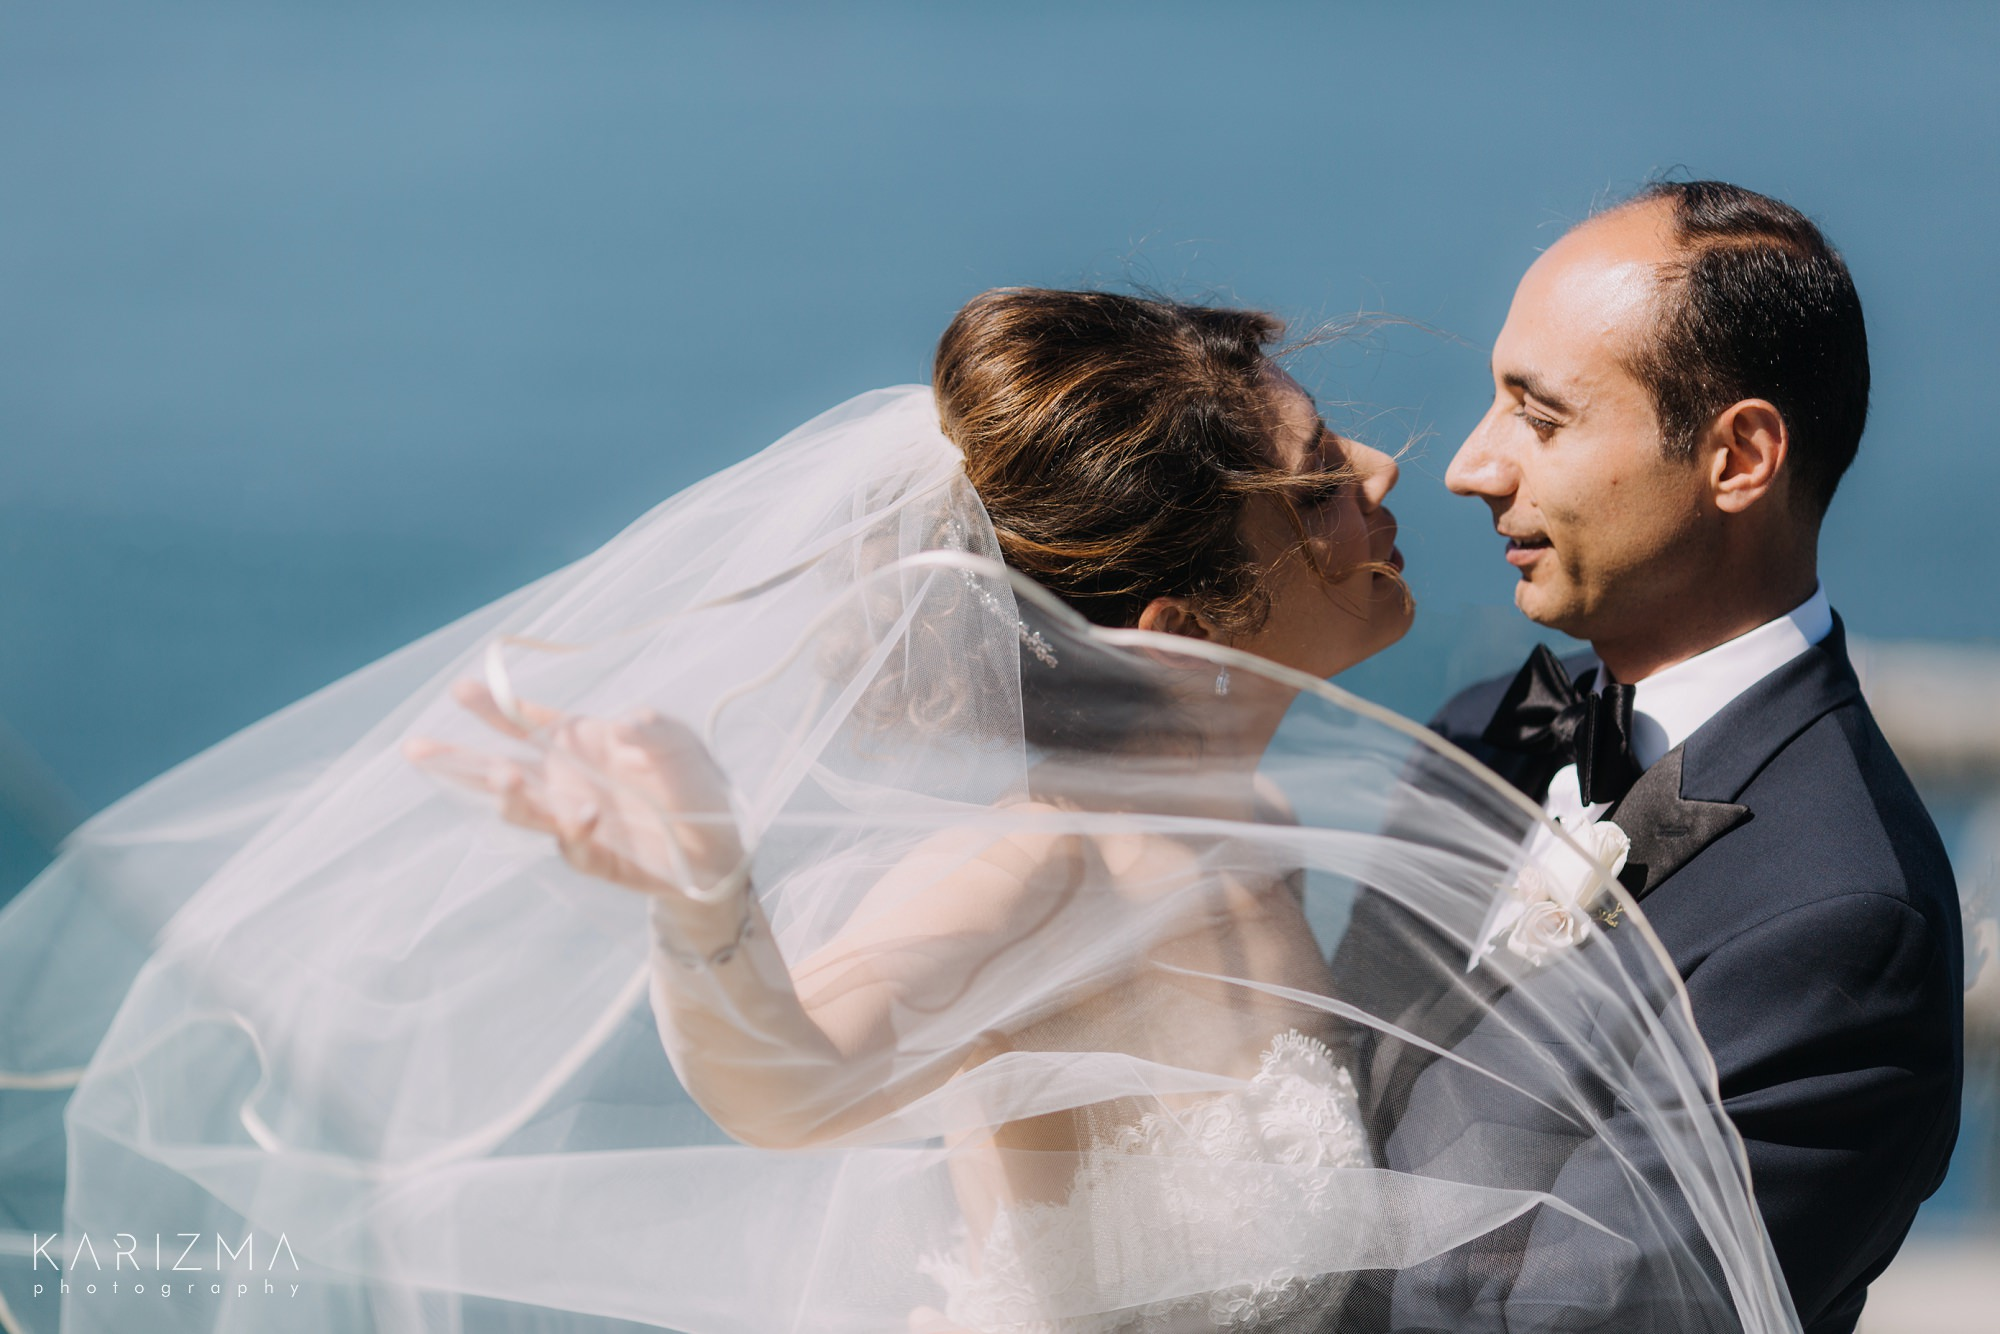 فساتين زفاف كاريزما